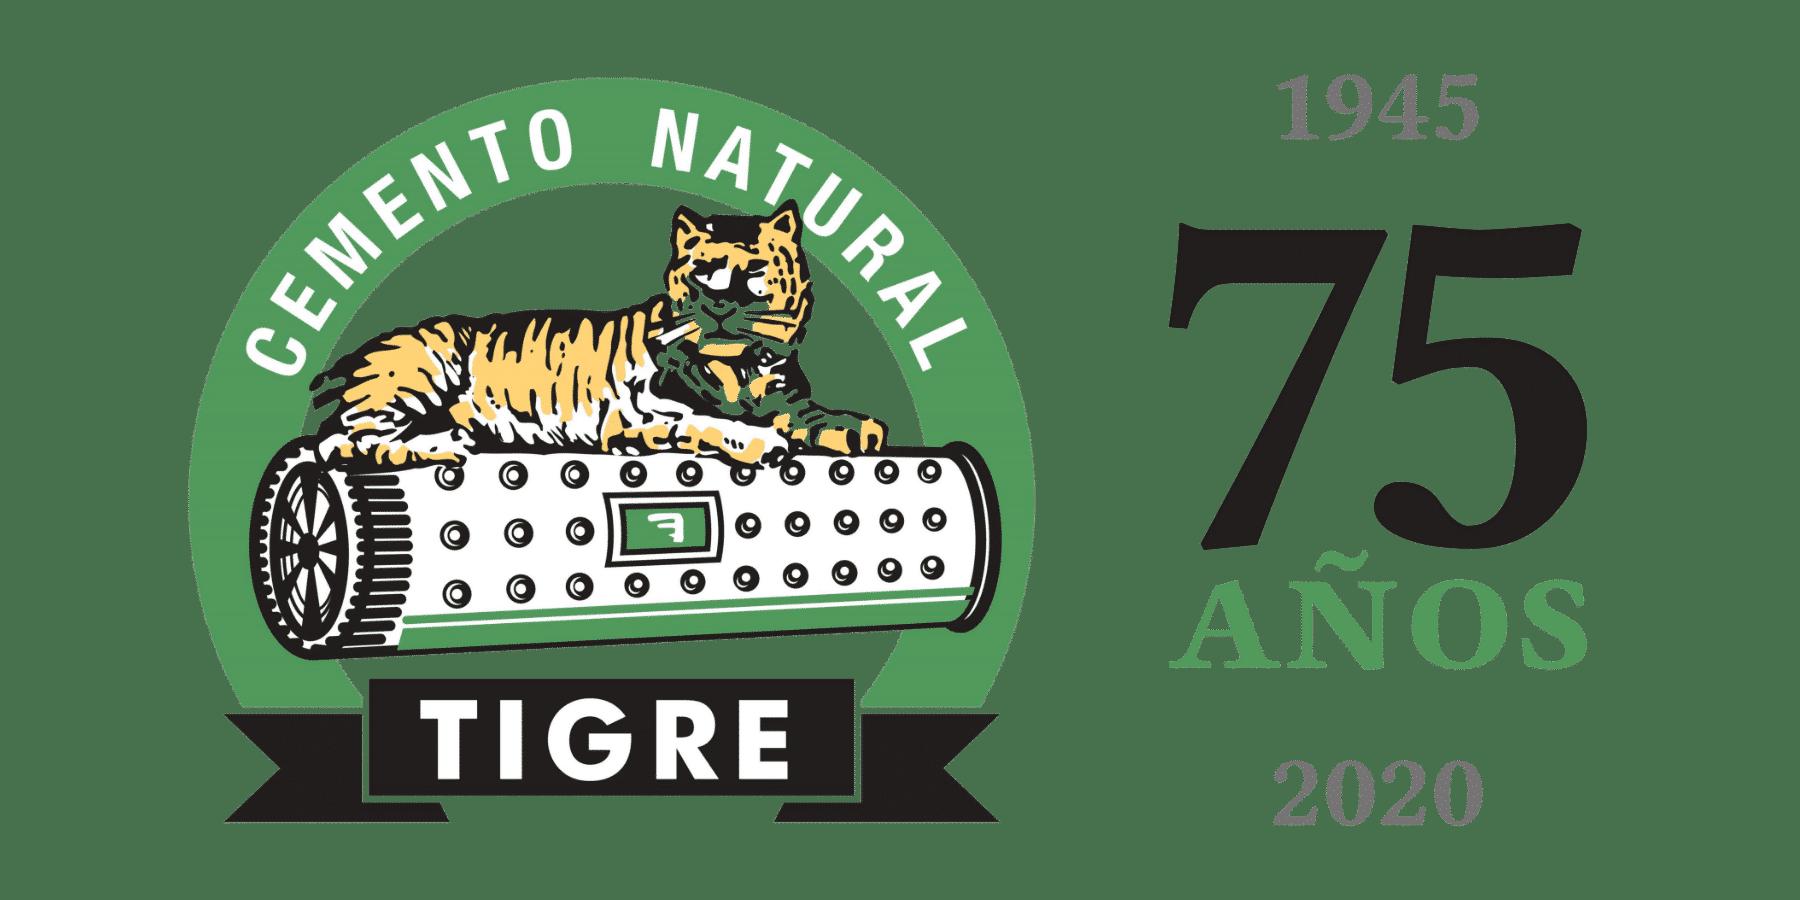 Cemento Natural Tigre